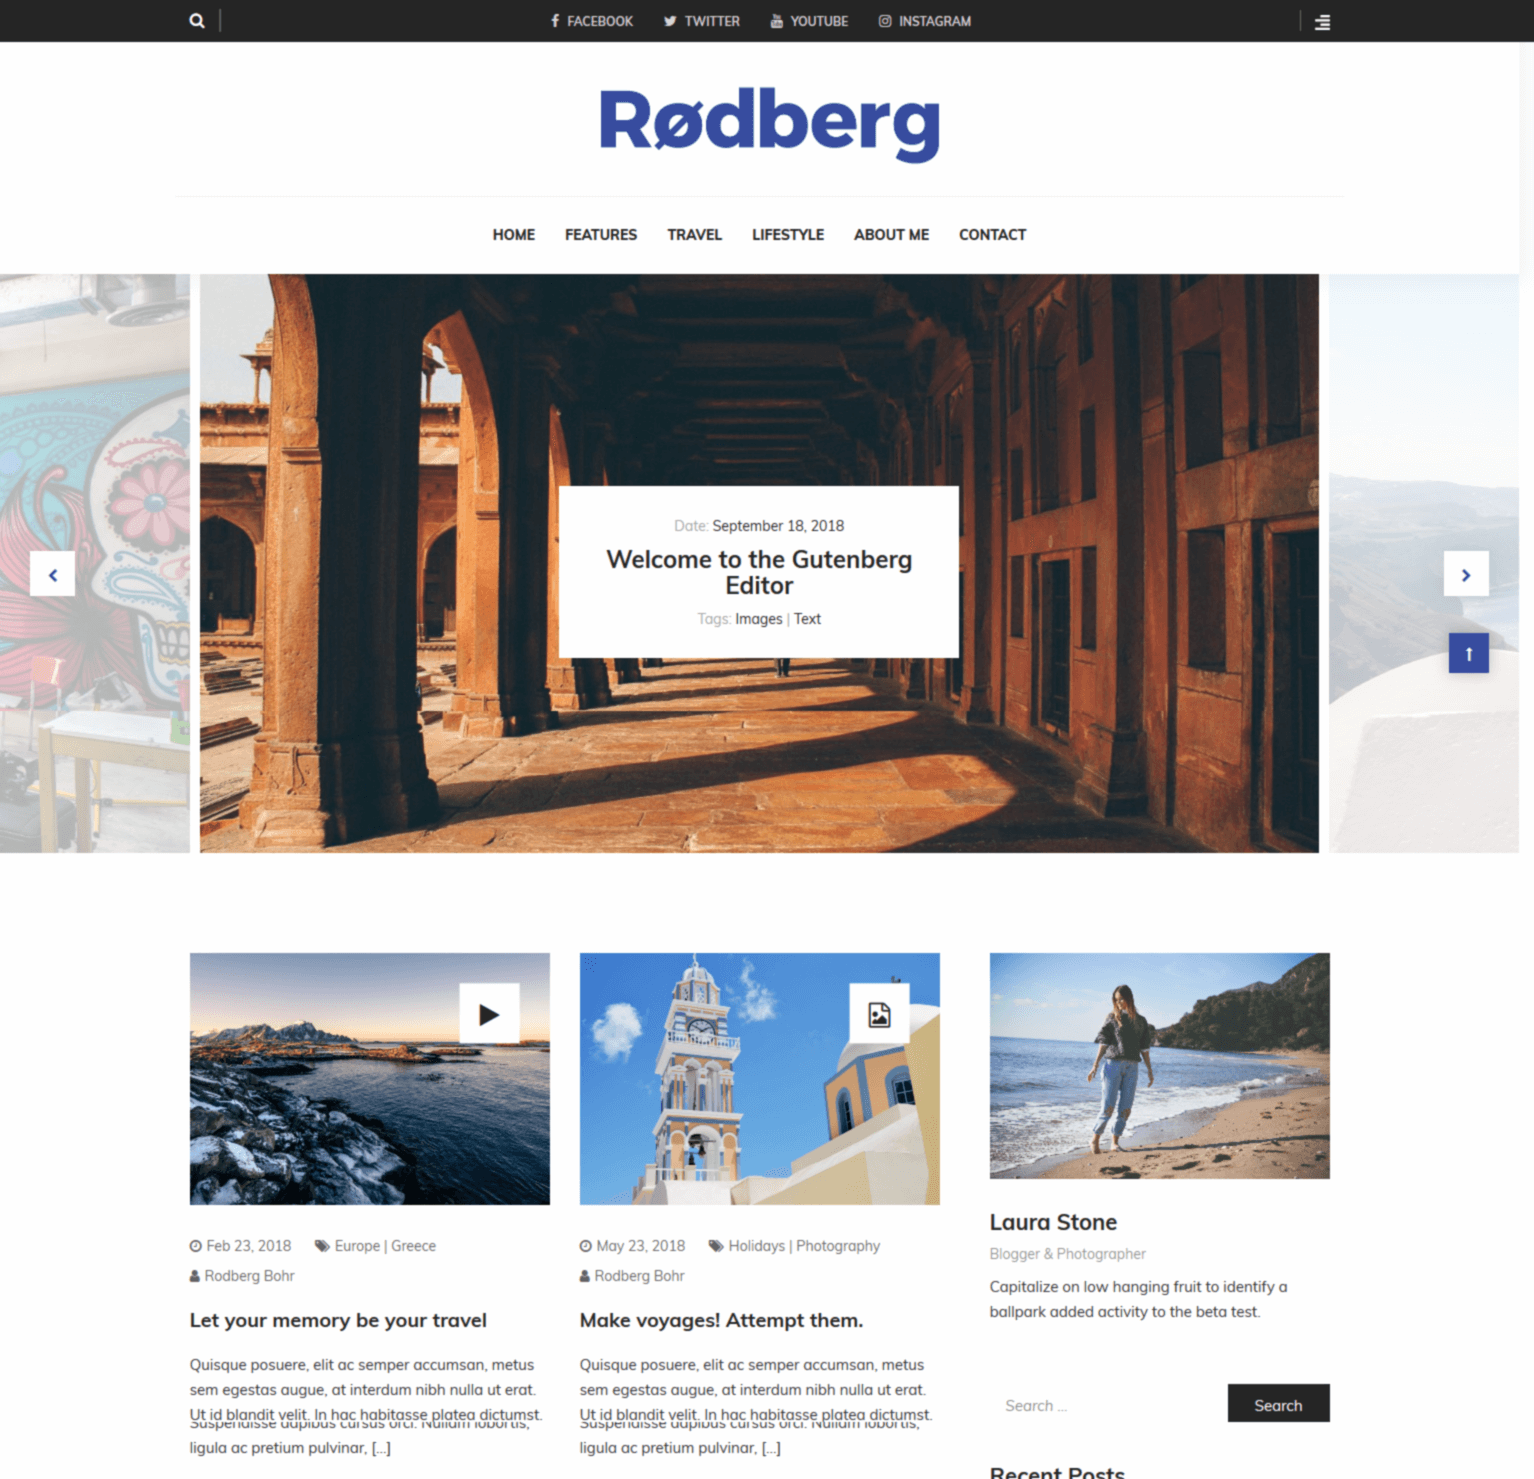 Rodberg – home1